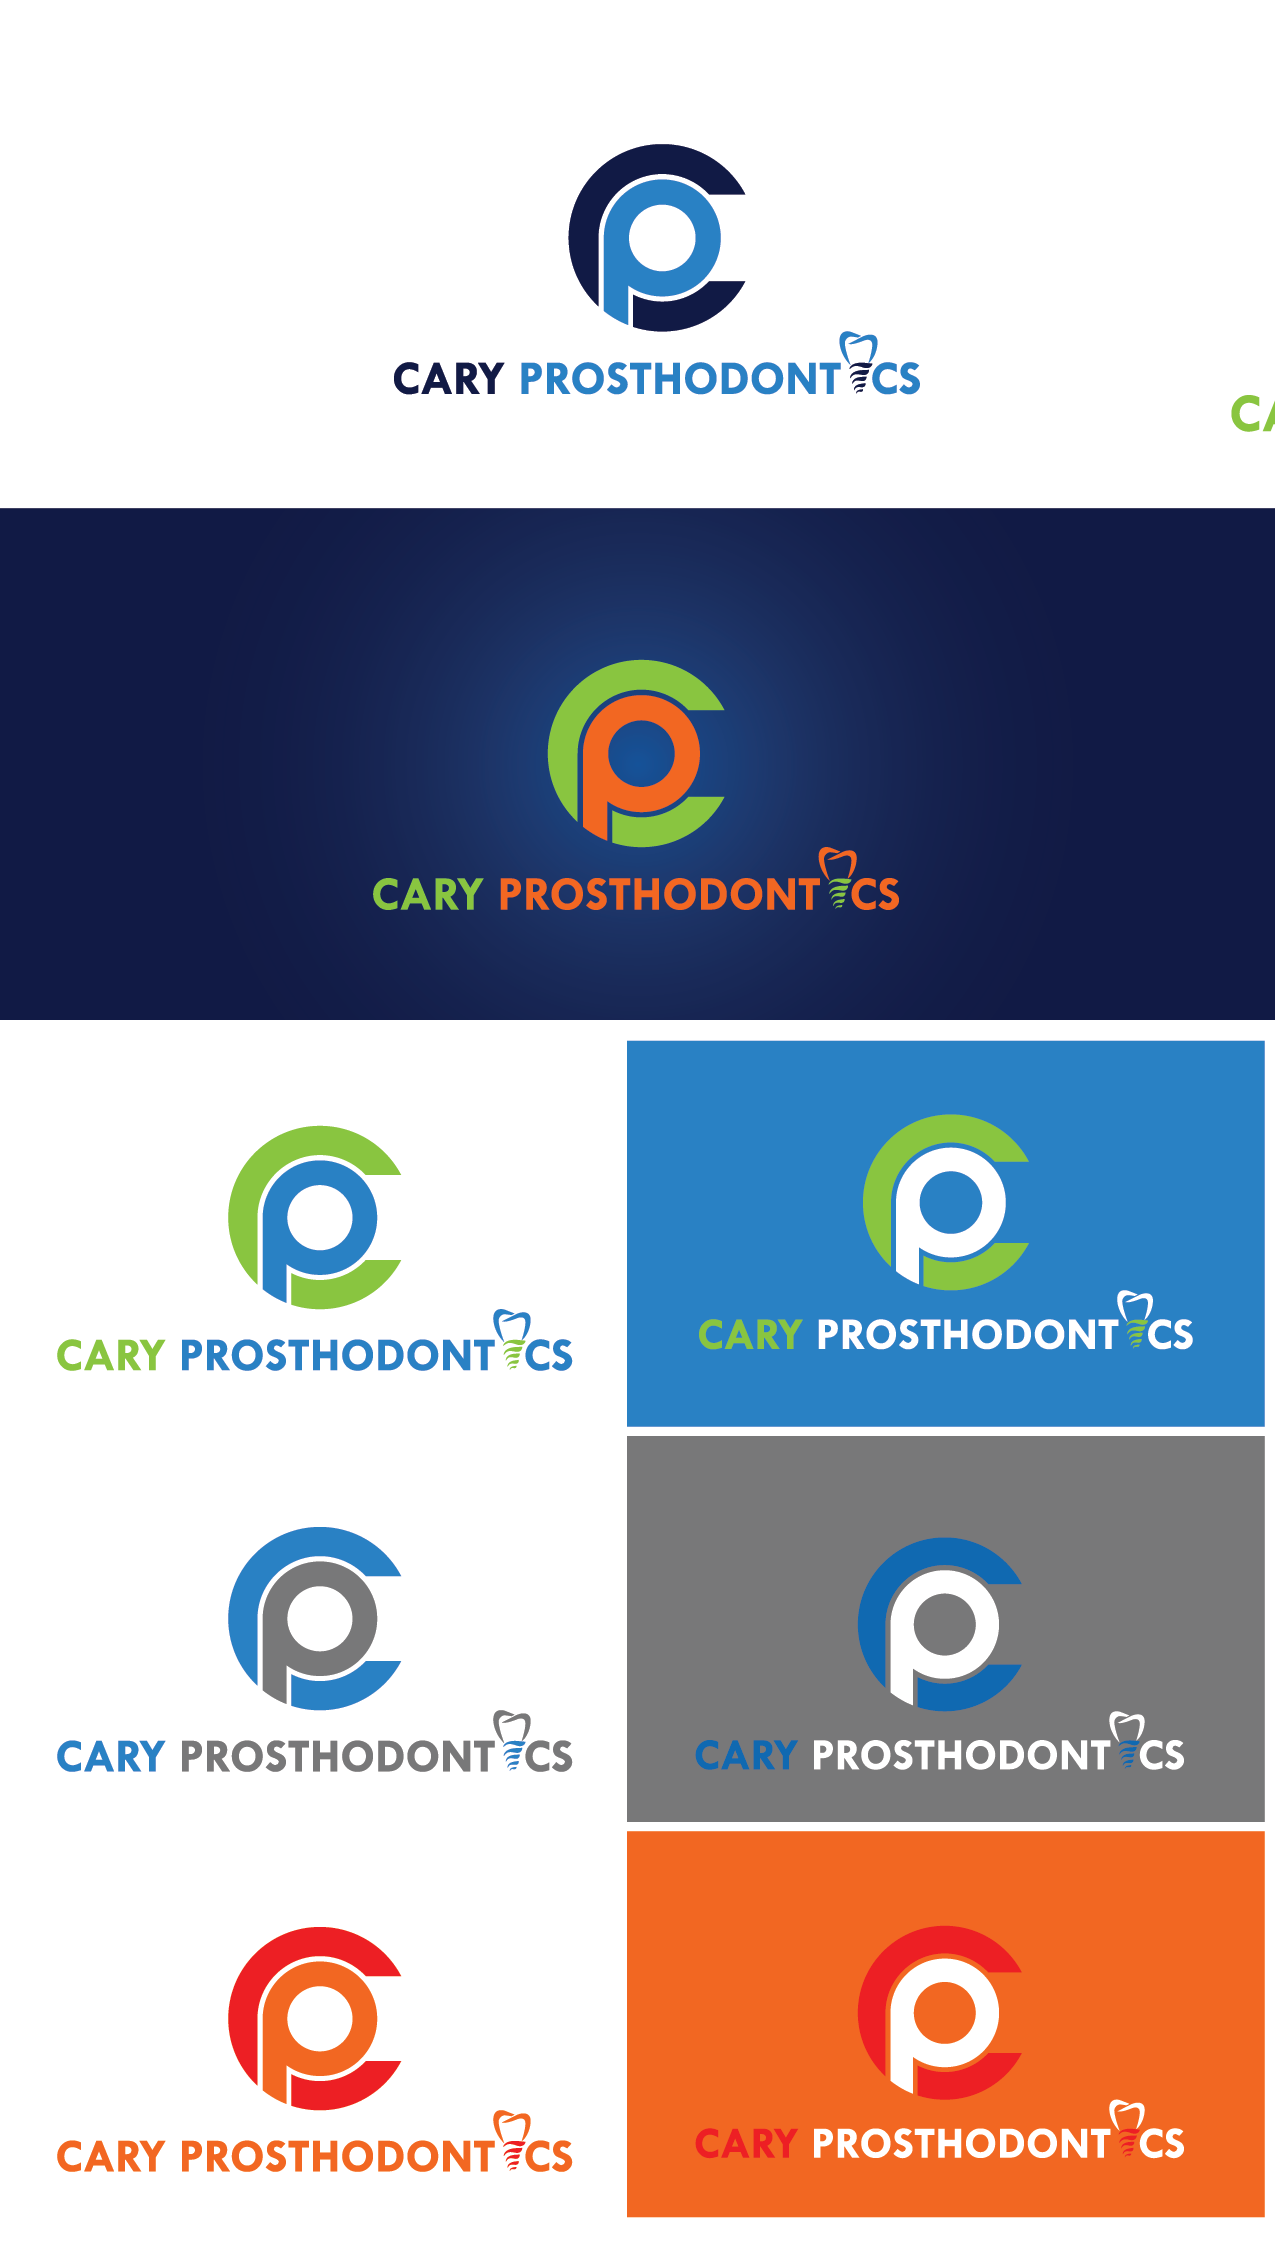 Logo Design by Private User - Entry No. 114 in the Logo Design Contest Cary Prosthodontics Logo Design.